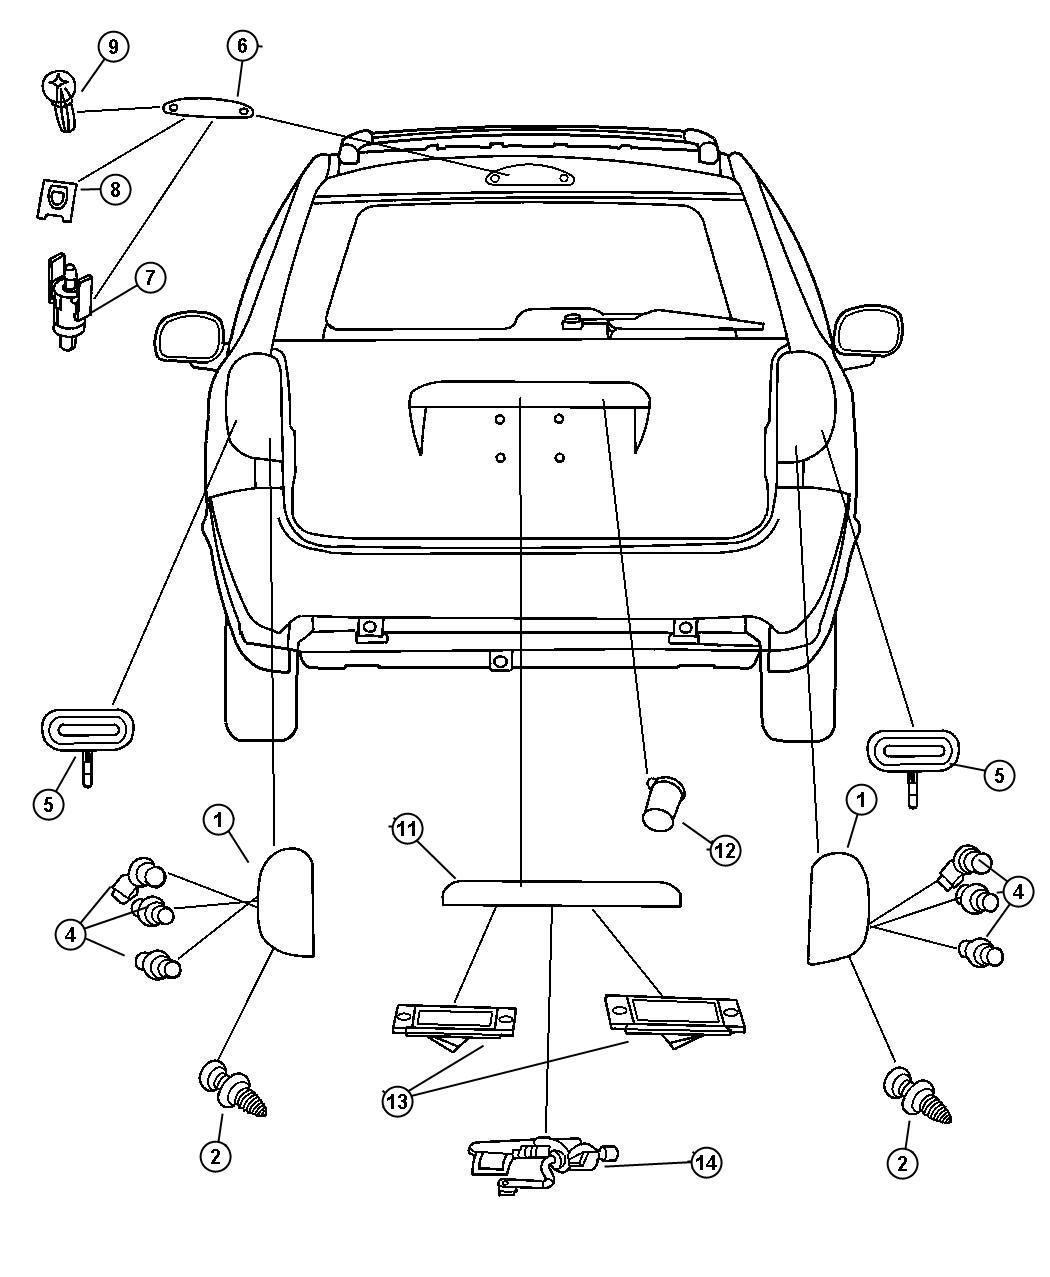 2004 Dodge Grand Caravan Wiring  License Lamp   License Plate Brow - Black